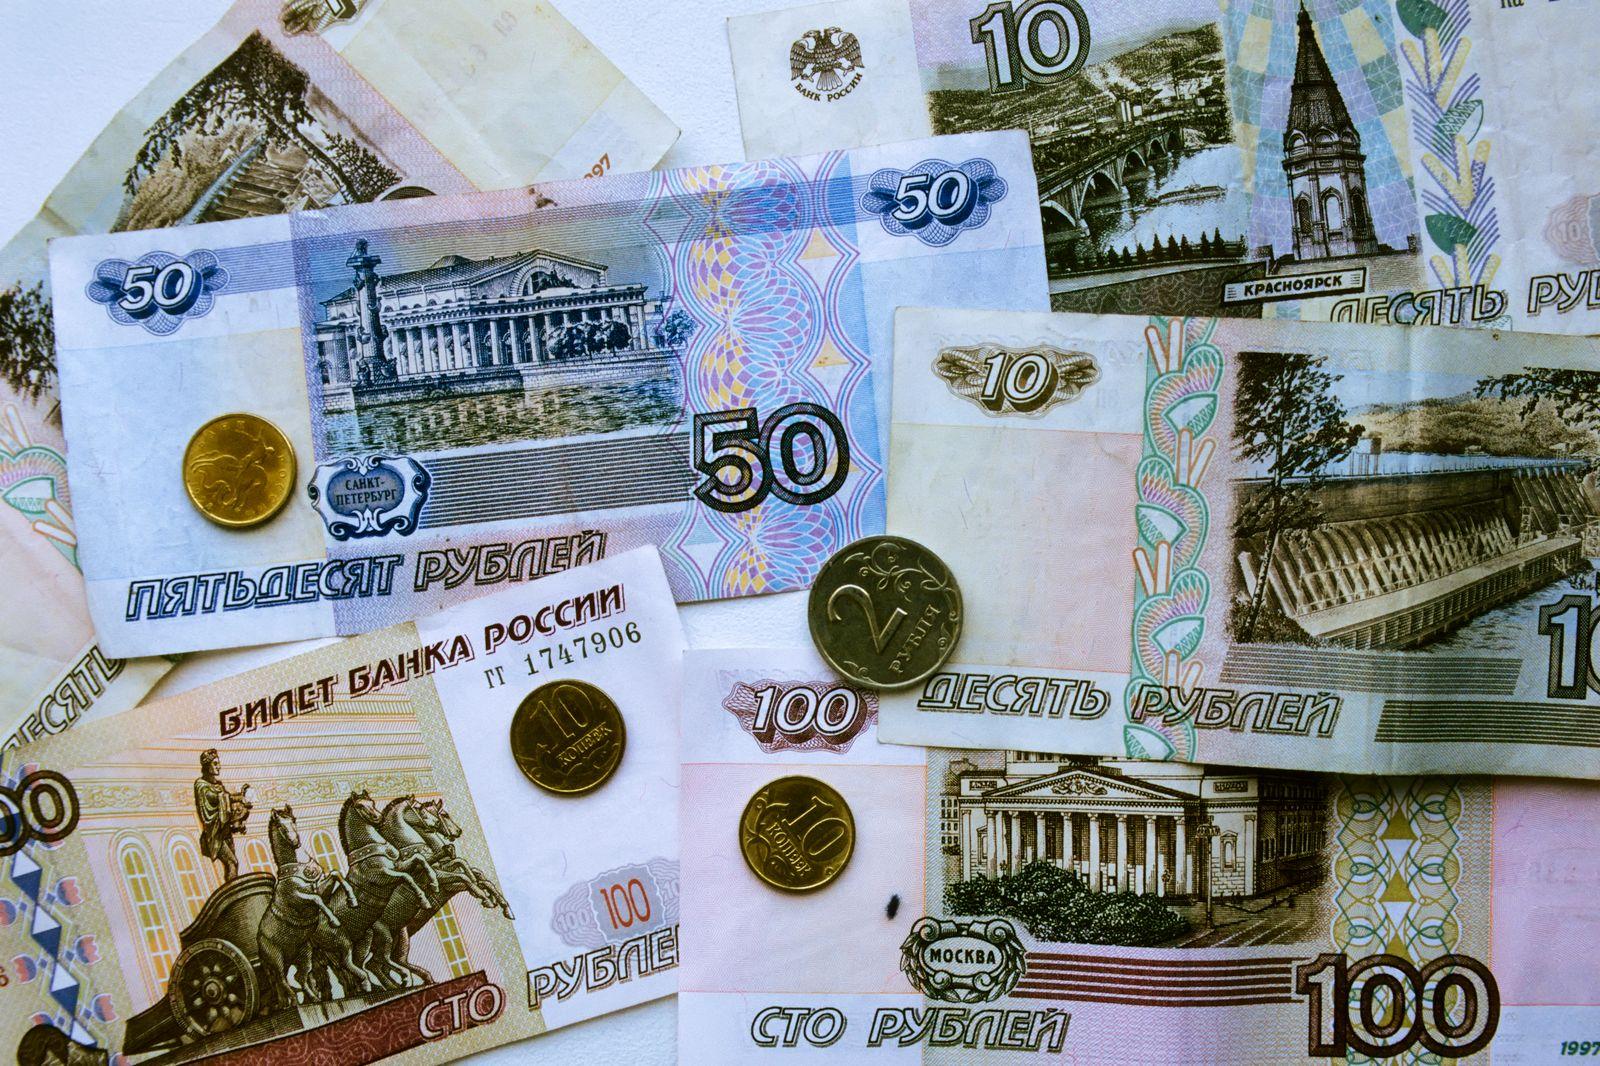 Pepsi Kriegsflotte - Russia, Russian Currency, Rubel